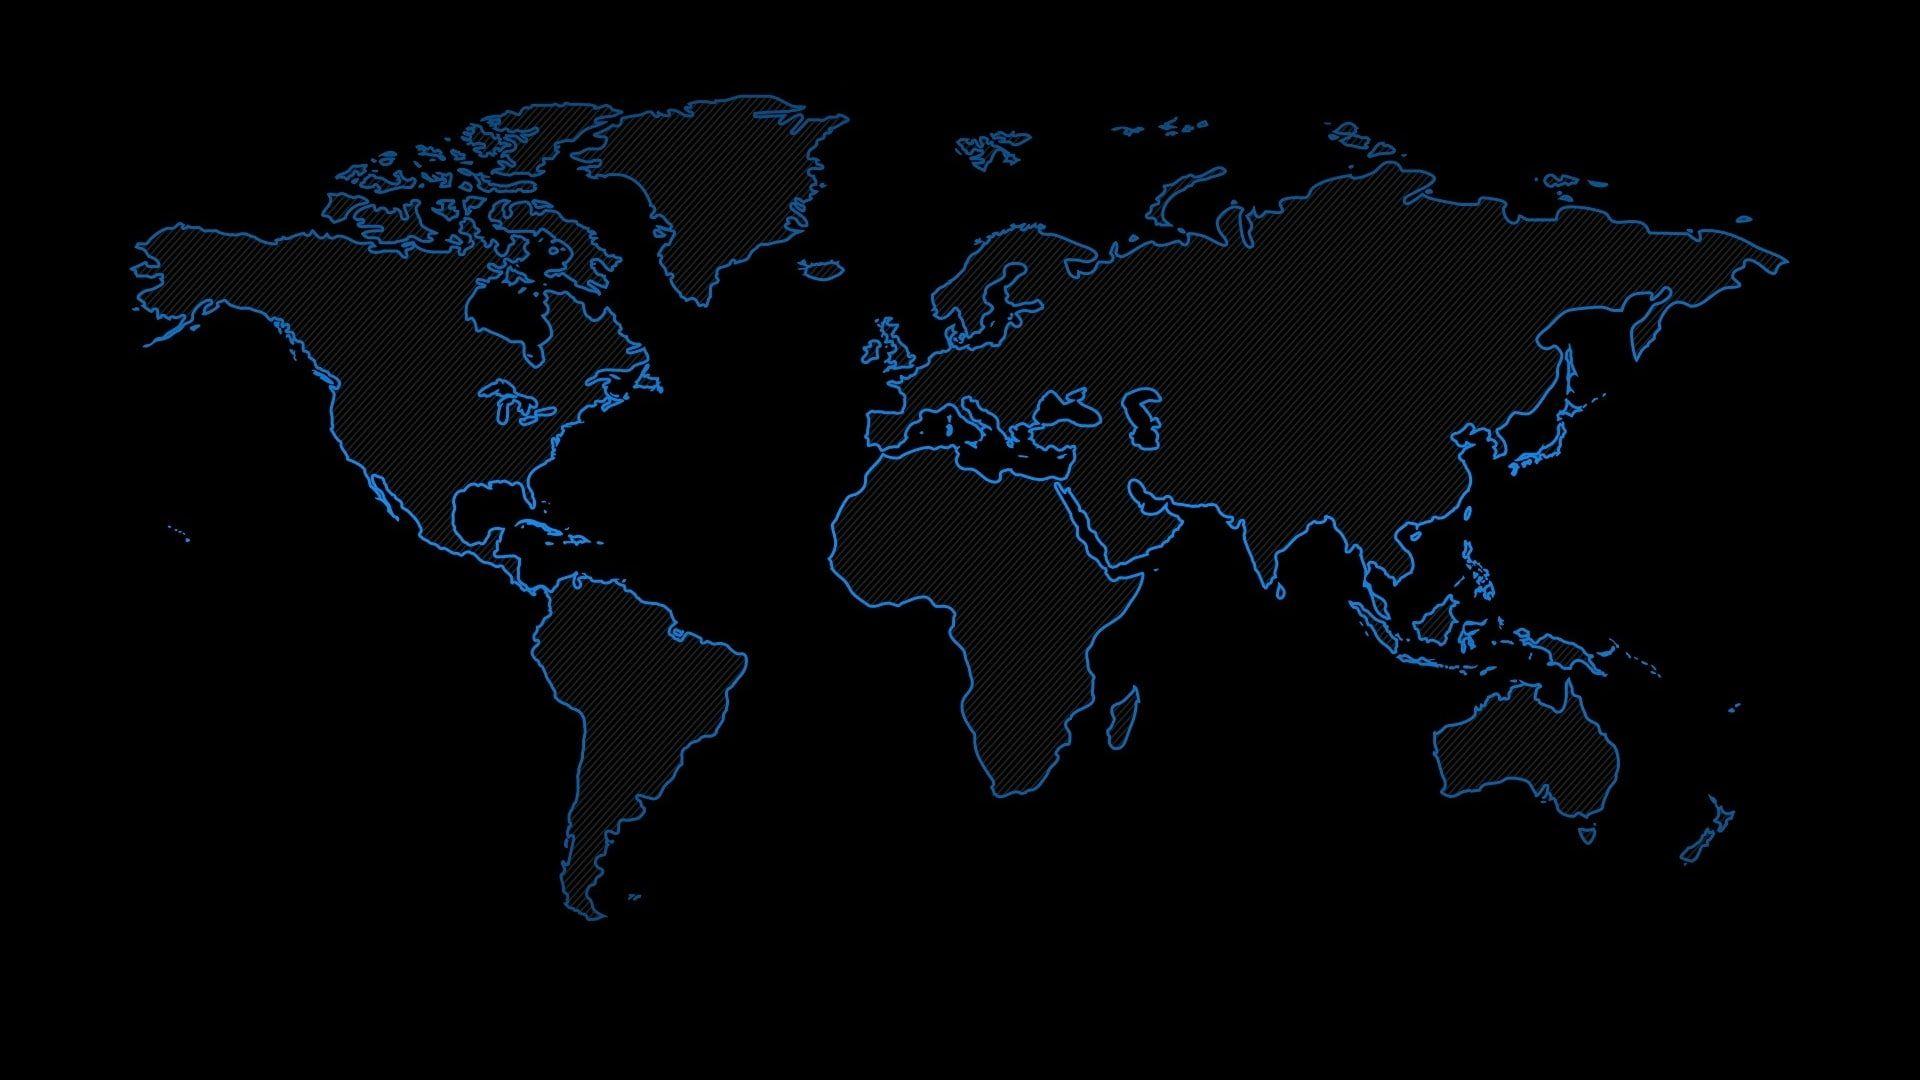 World Map Mural Black And White Fresh Black And White World Map Wall Mural Wallpaper Hd Wallpapers I Bd D World Map Wallpaper World Wallpaper Cool World Map